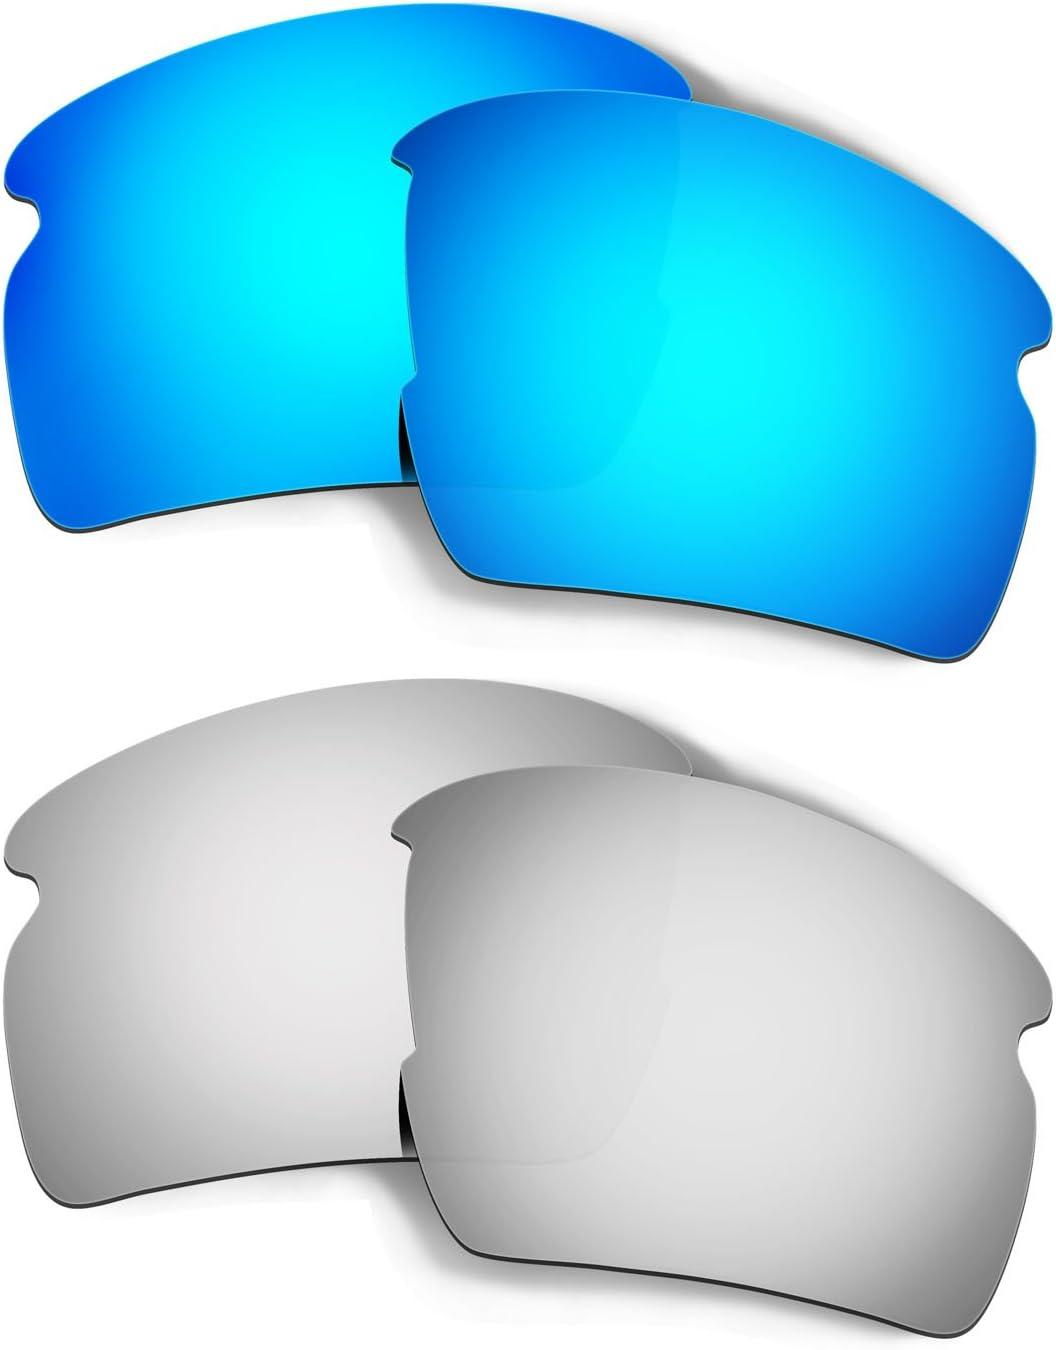 HKUCO Replacement Lenses for Oakley Flak 2.0 AF OO9271 Sunglasses Blue/Titanium